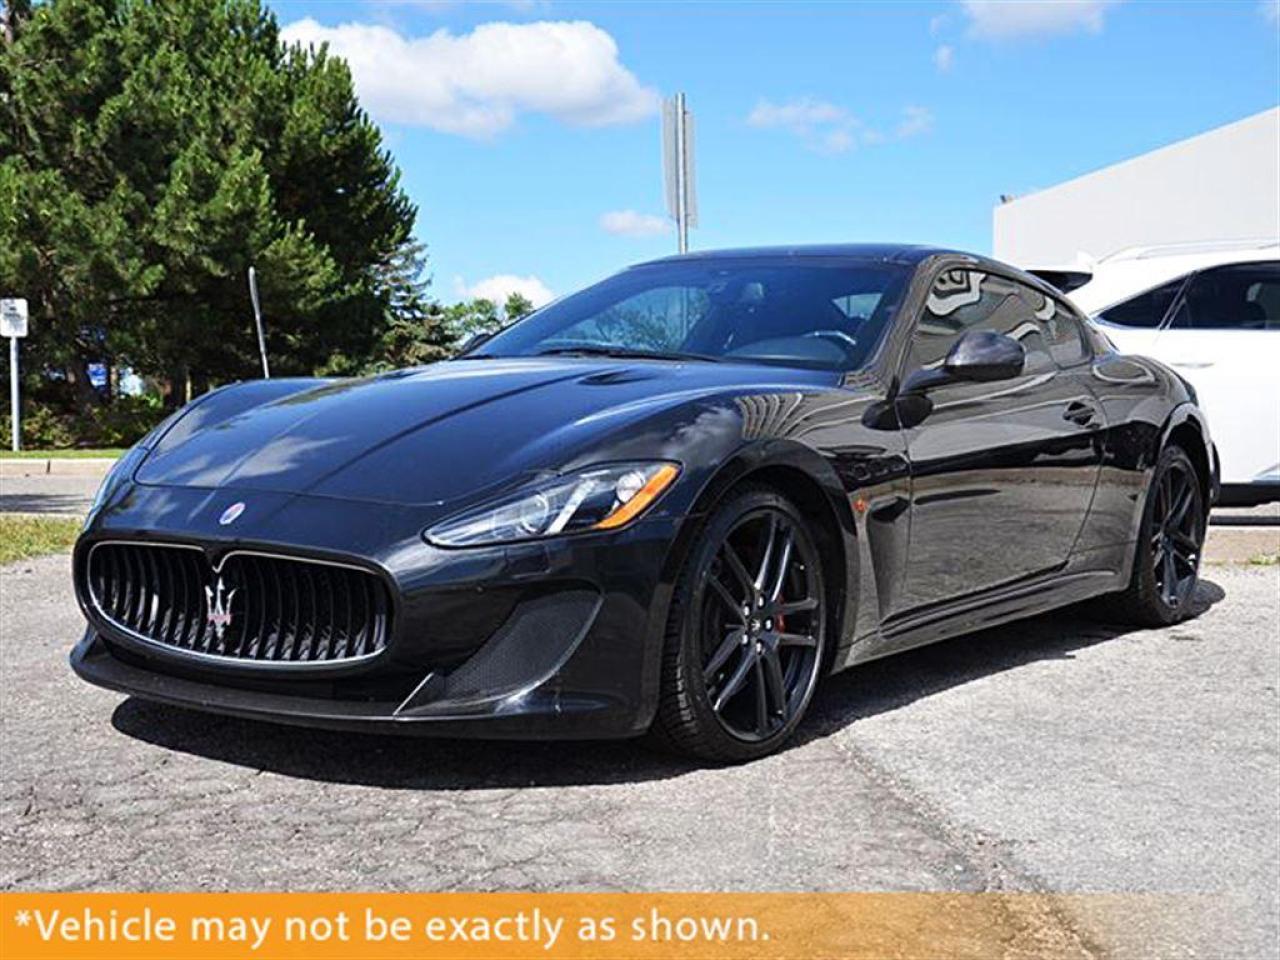 Used 2013 Maserati Granturismo Sold Mc Sport Line